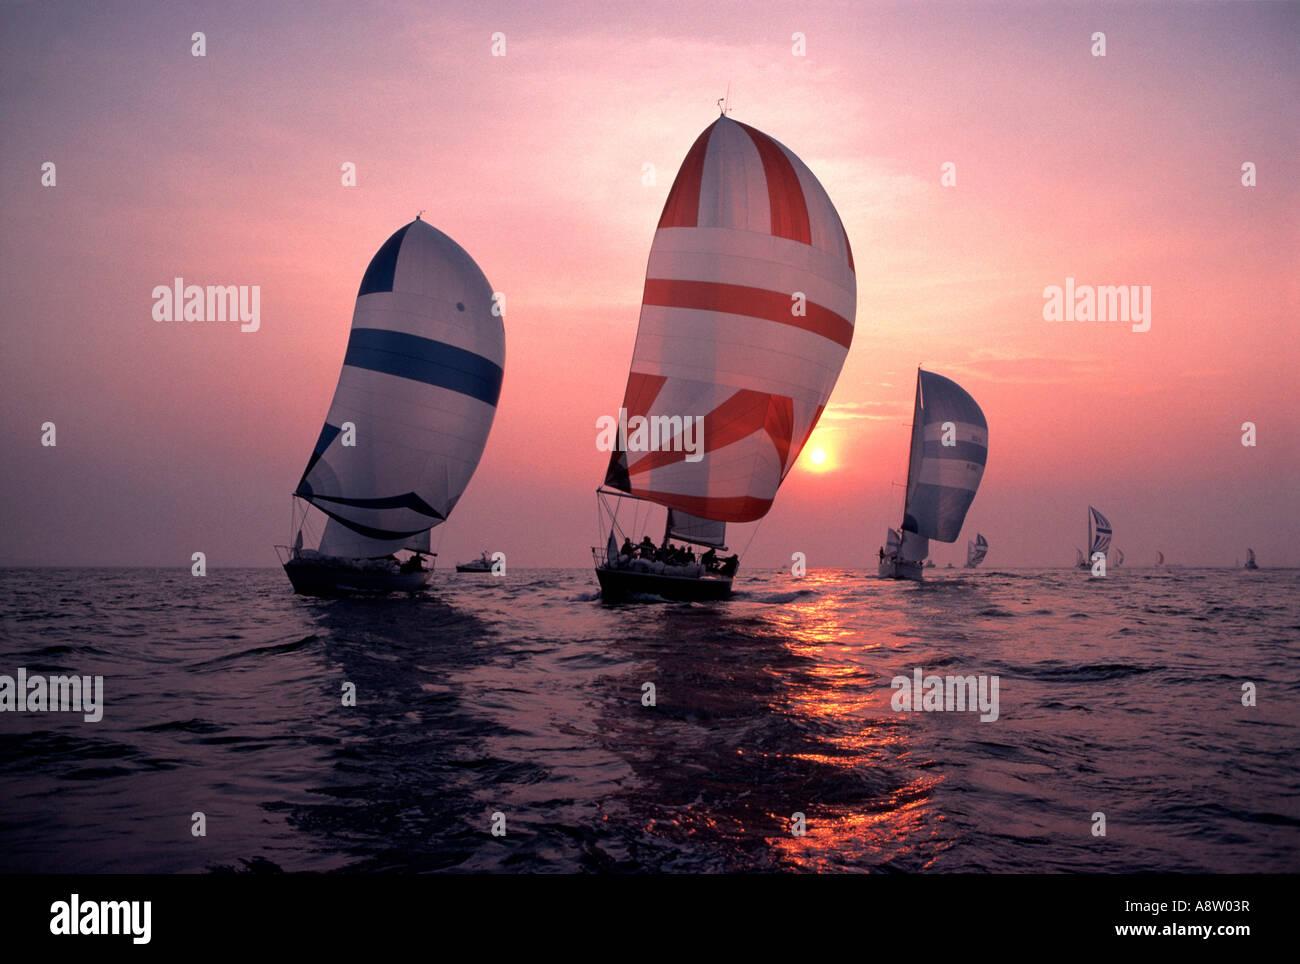 Sailing Yachts Yacht Race At Sunset Spinnaker Sails